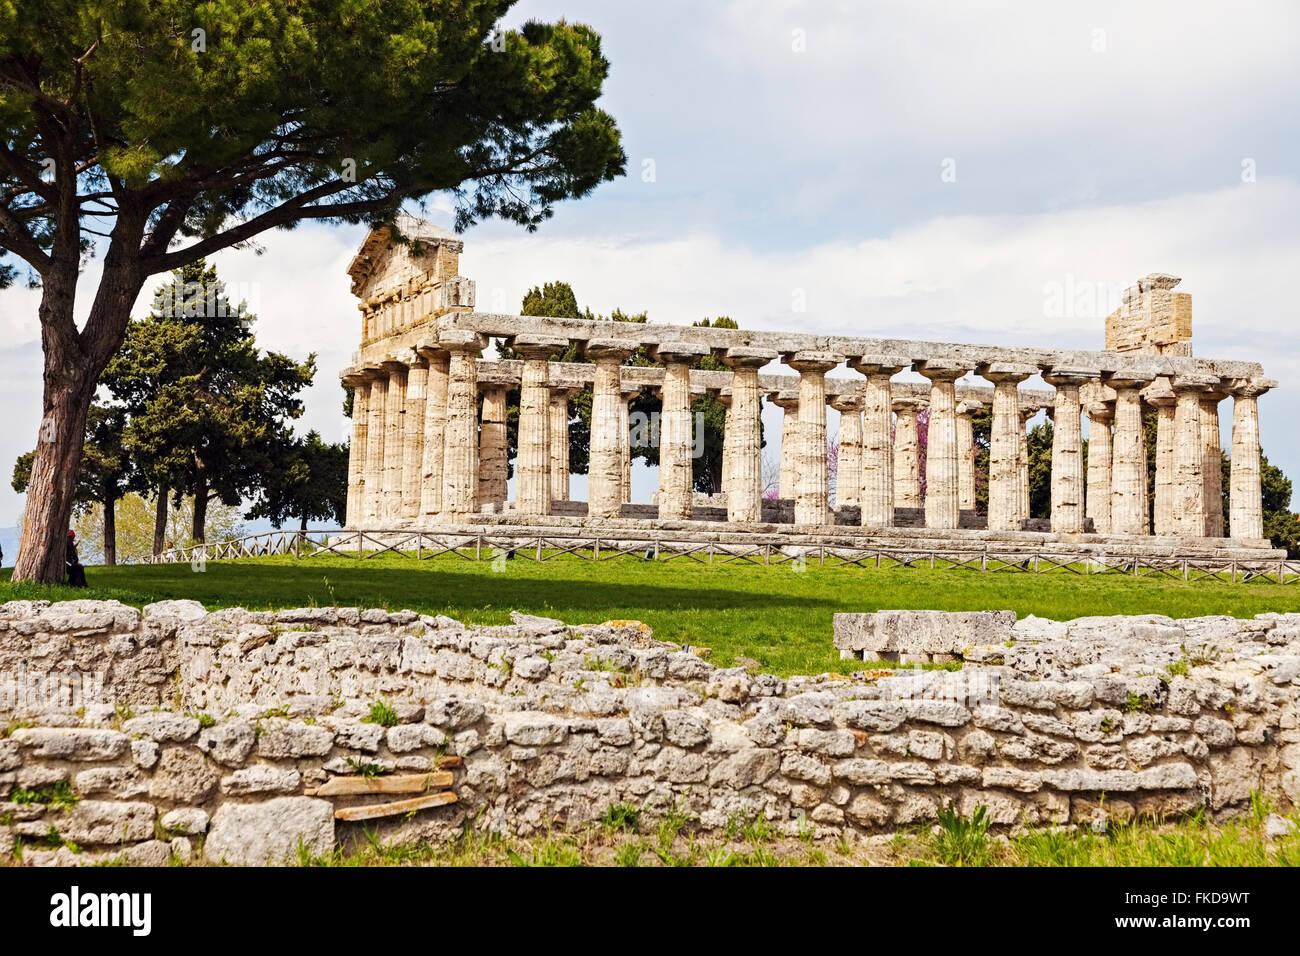 Columnas arquitectónicas antiguas ruinas de Paestum Imagen De Stock